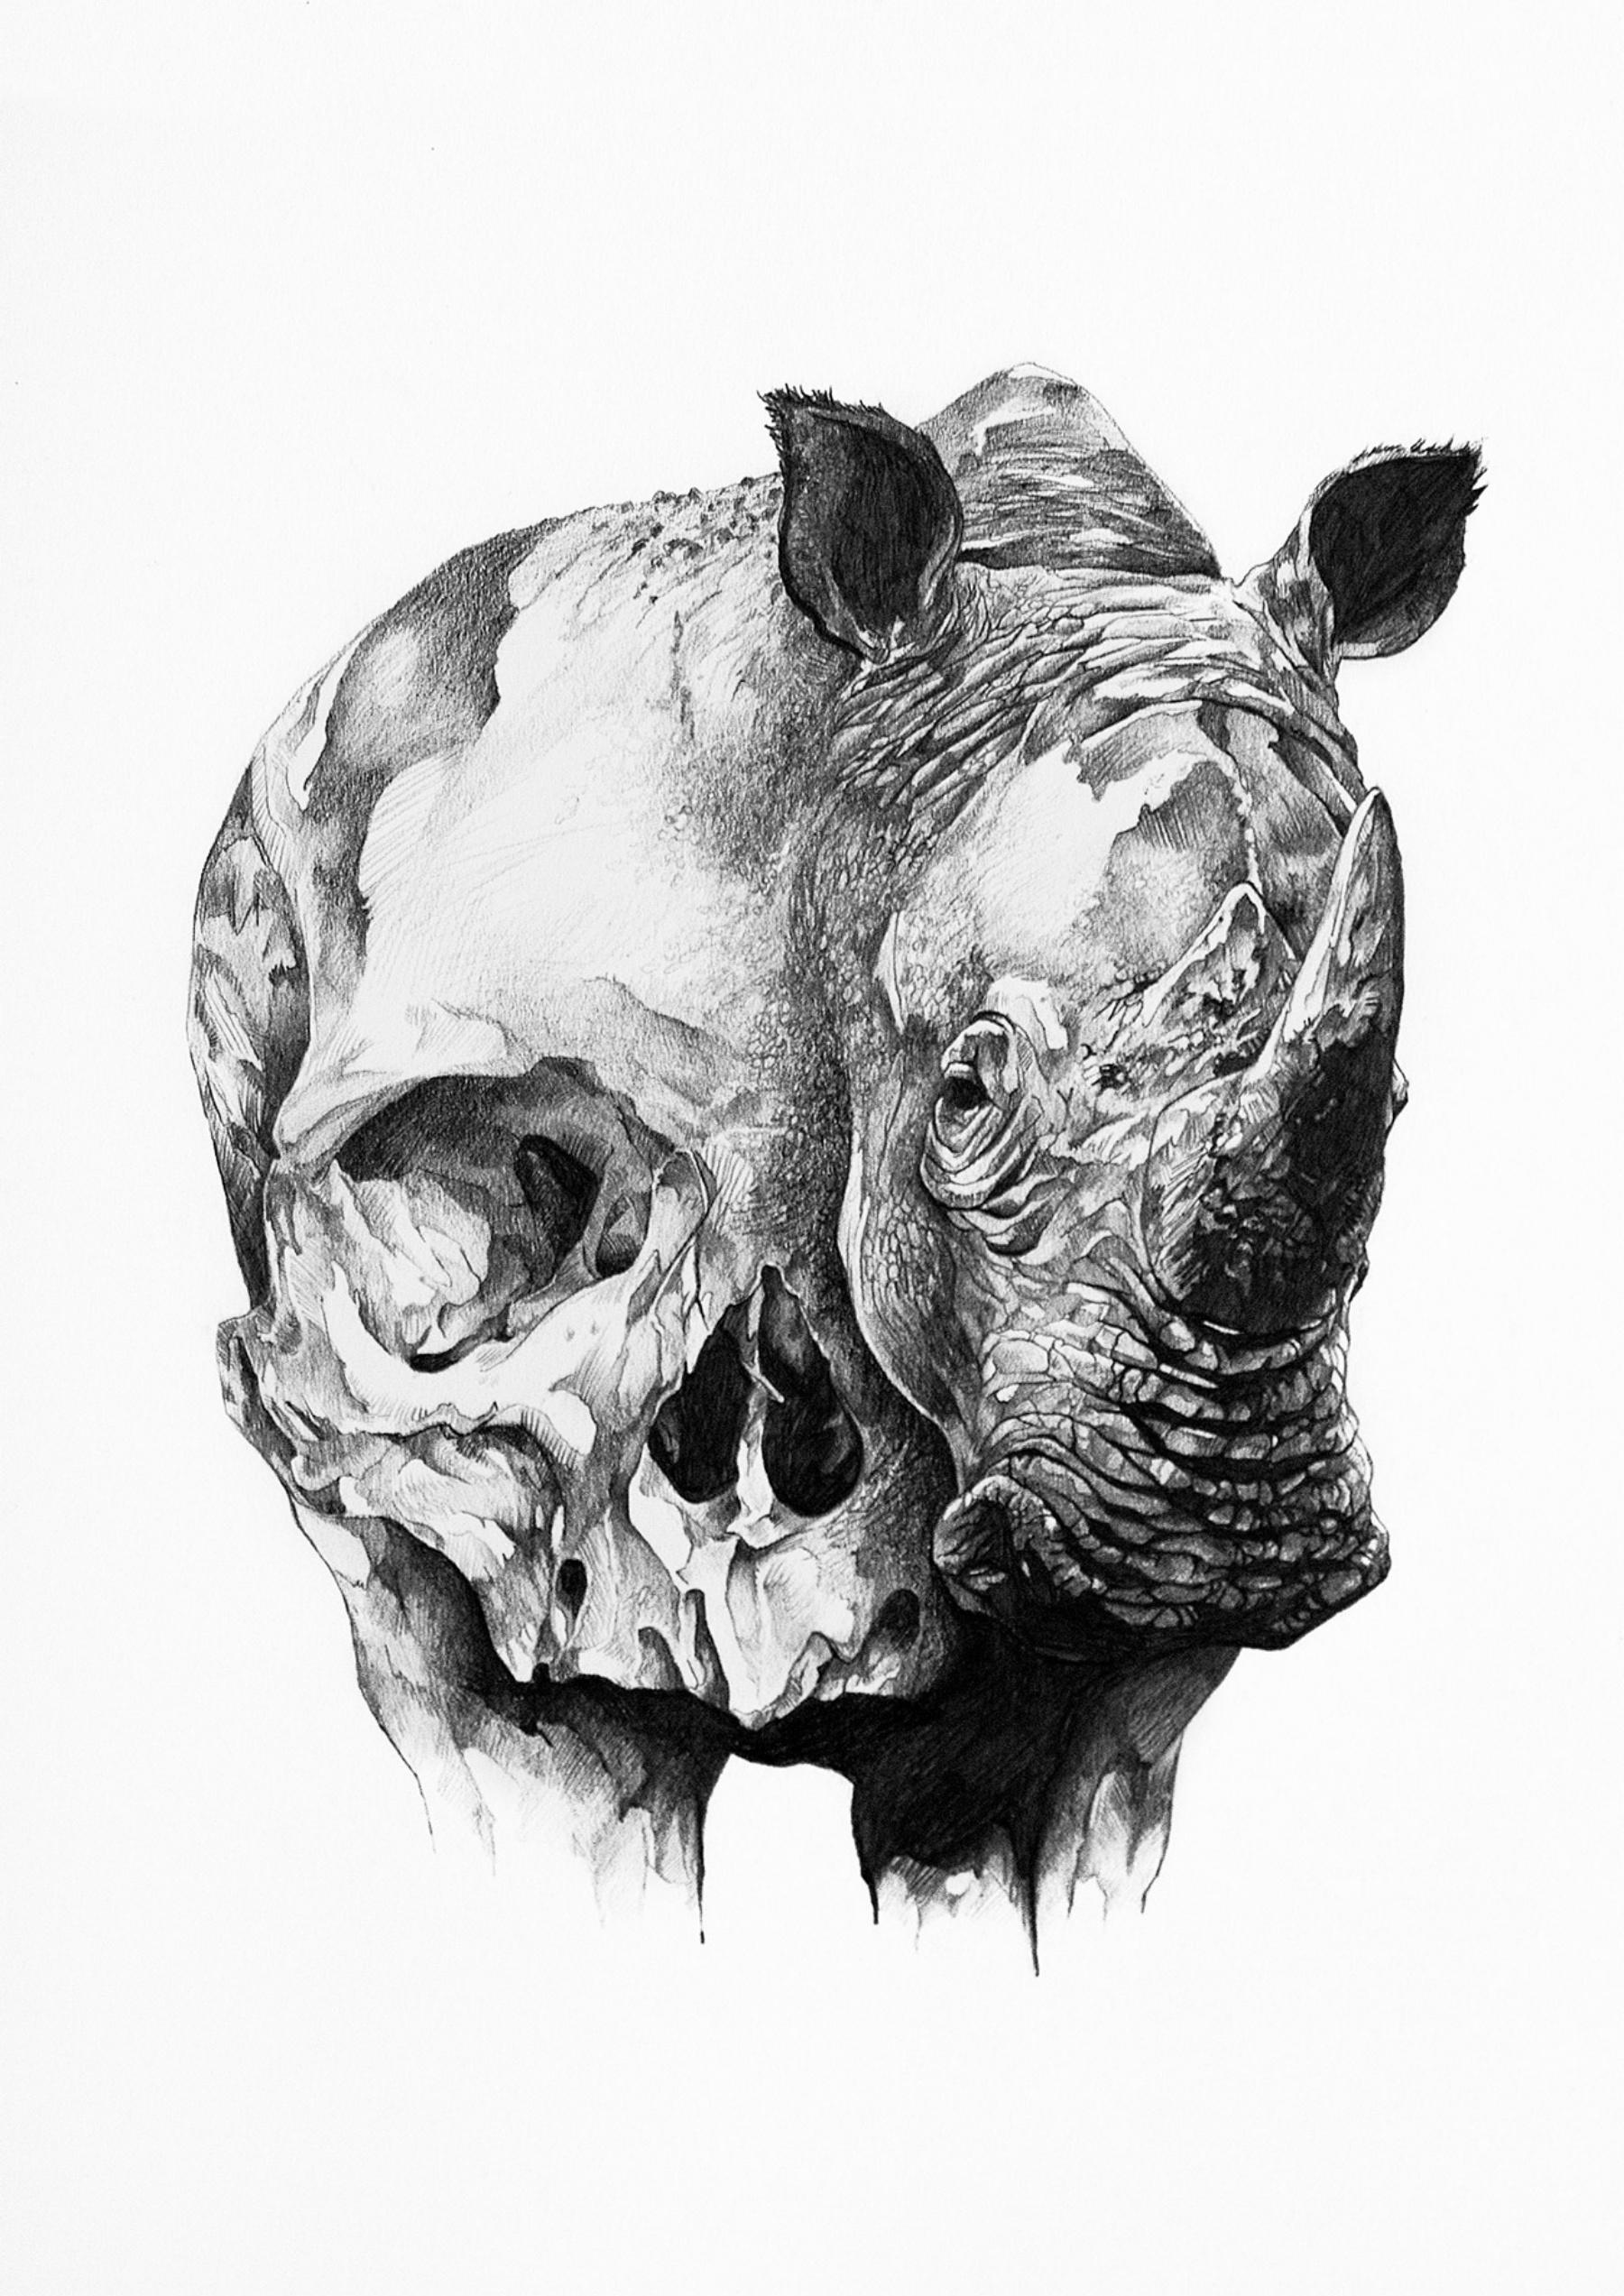 Drawn rhino realistic And Black Ivan_Kamargio_Skull_Drawings_4 White Skull